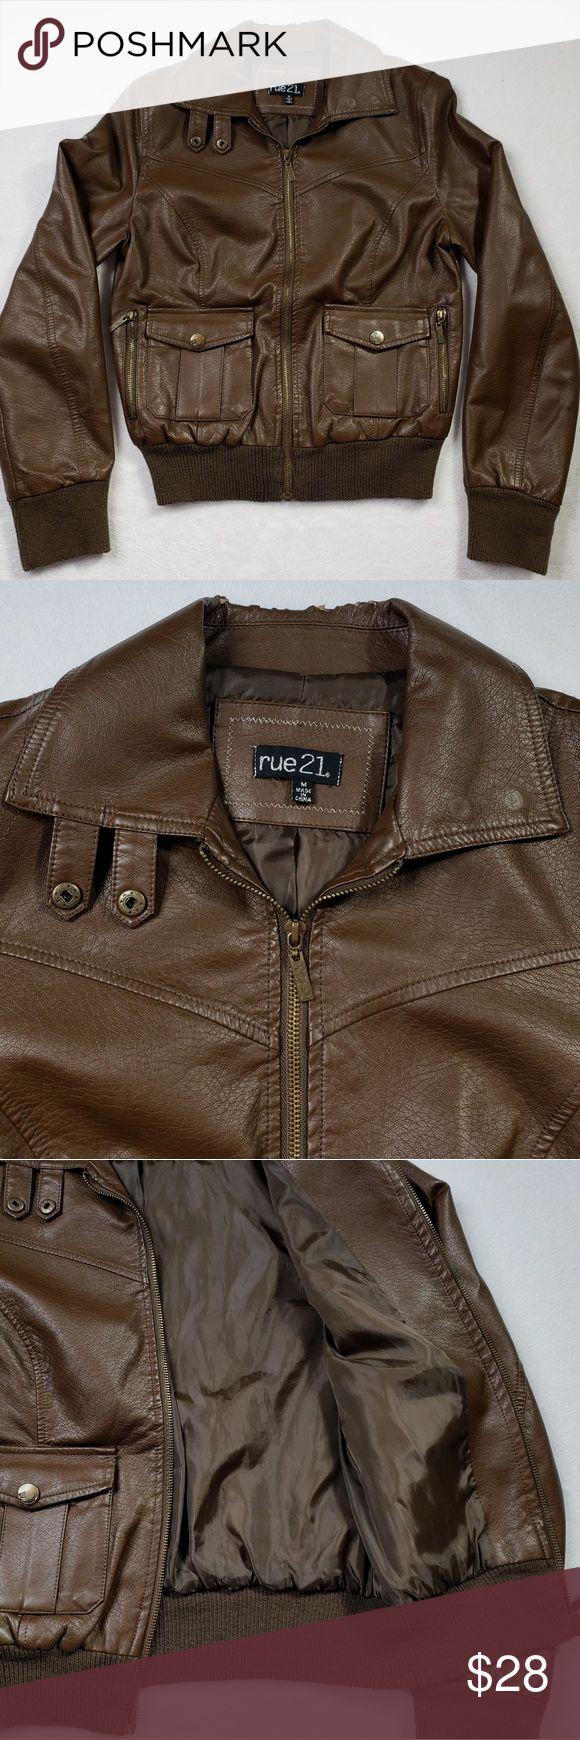 Rue 21 Brown Faux Leather Bomber Jacket sz Medium Faux